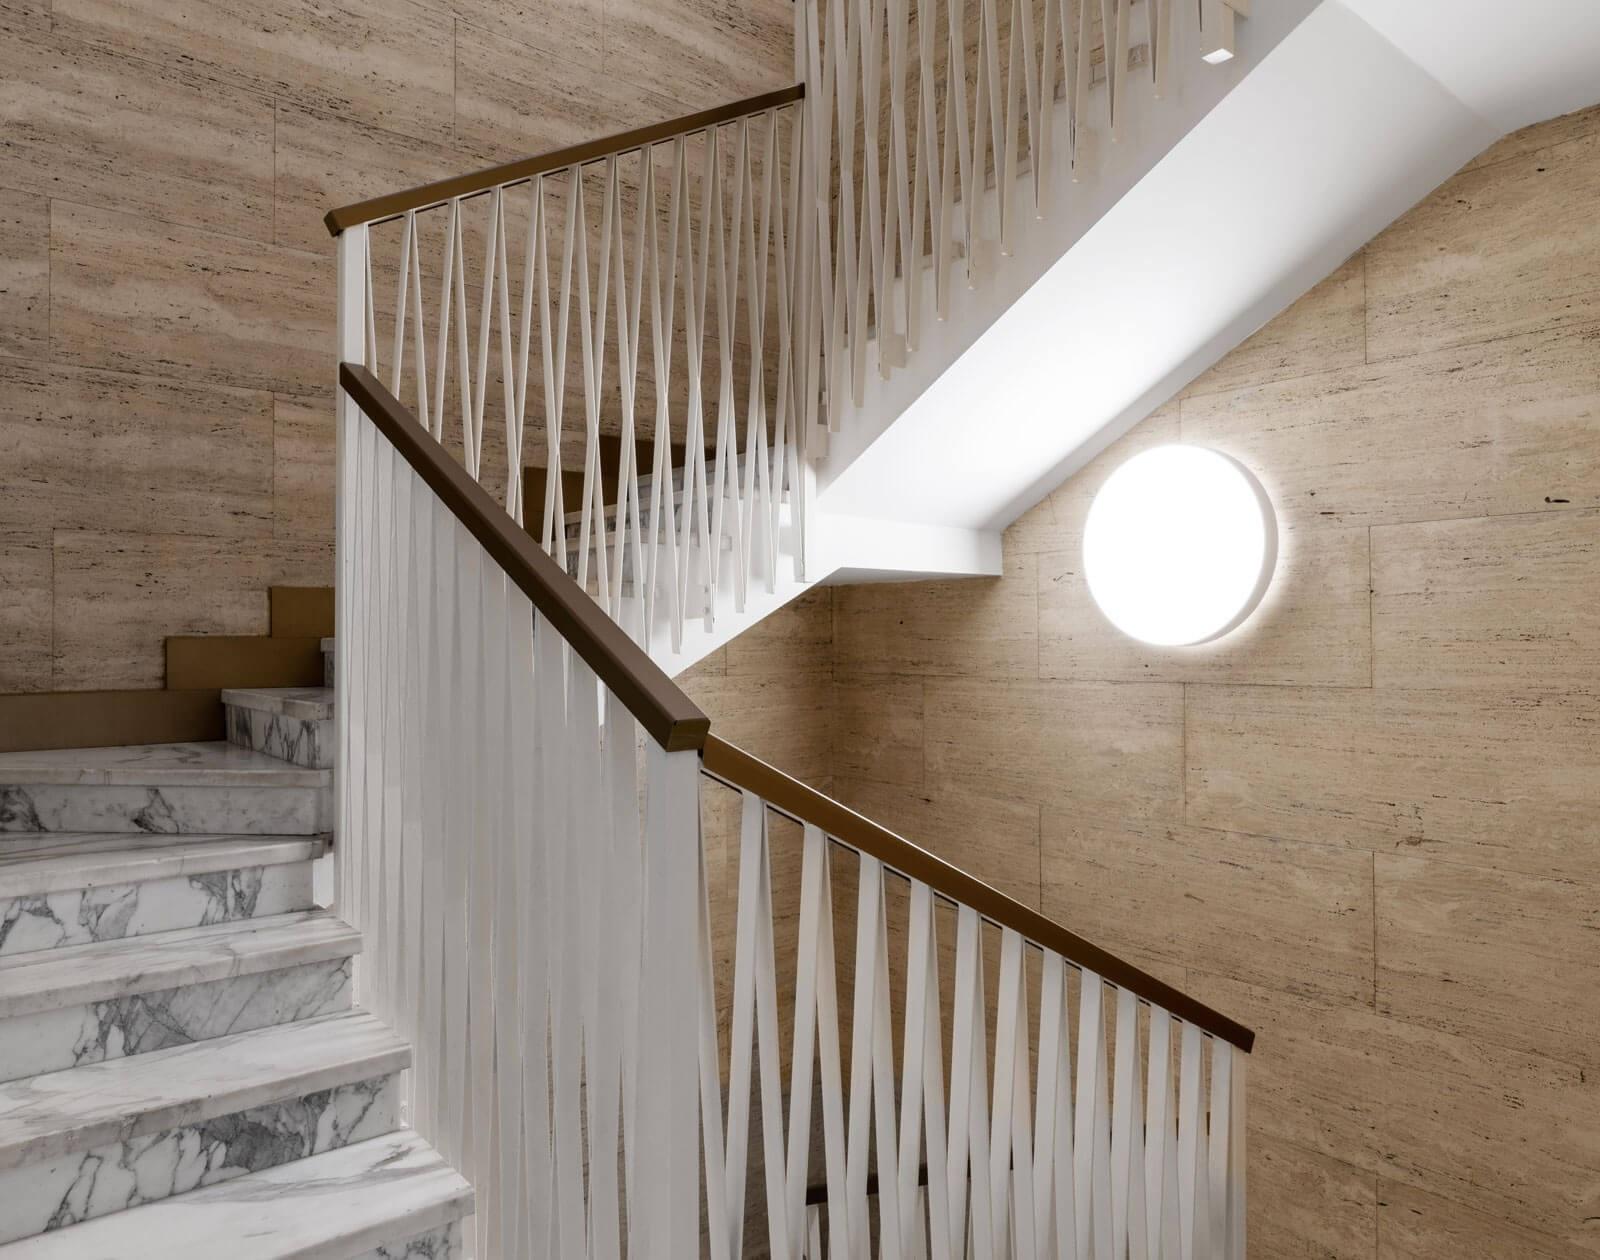 Linea Light Casa Girola